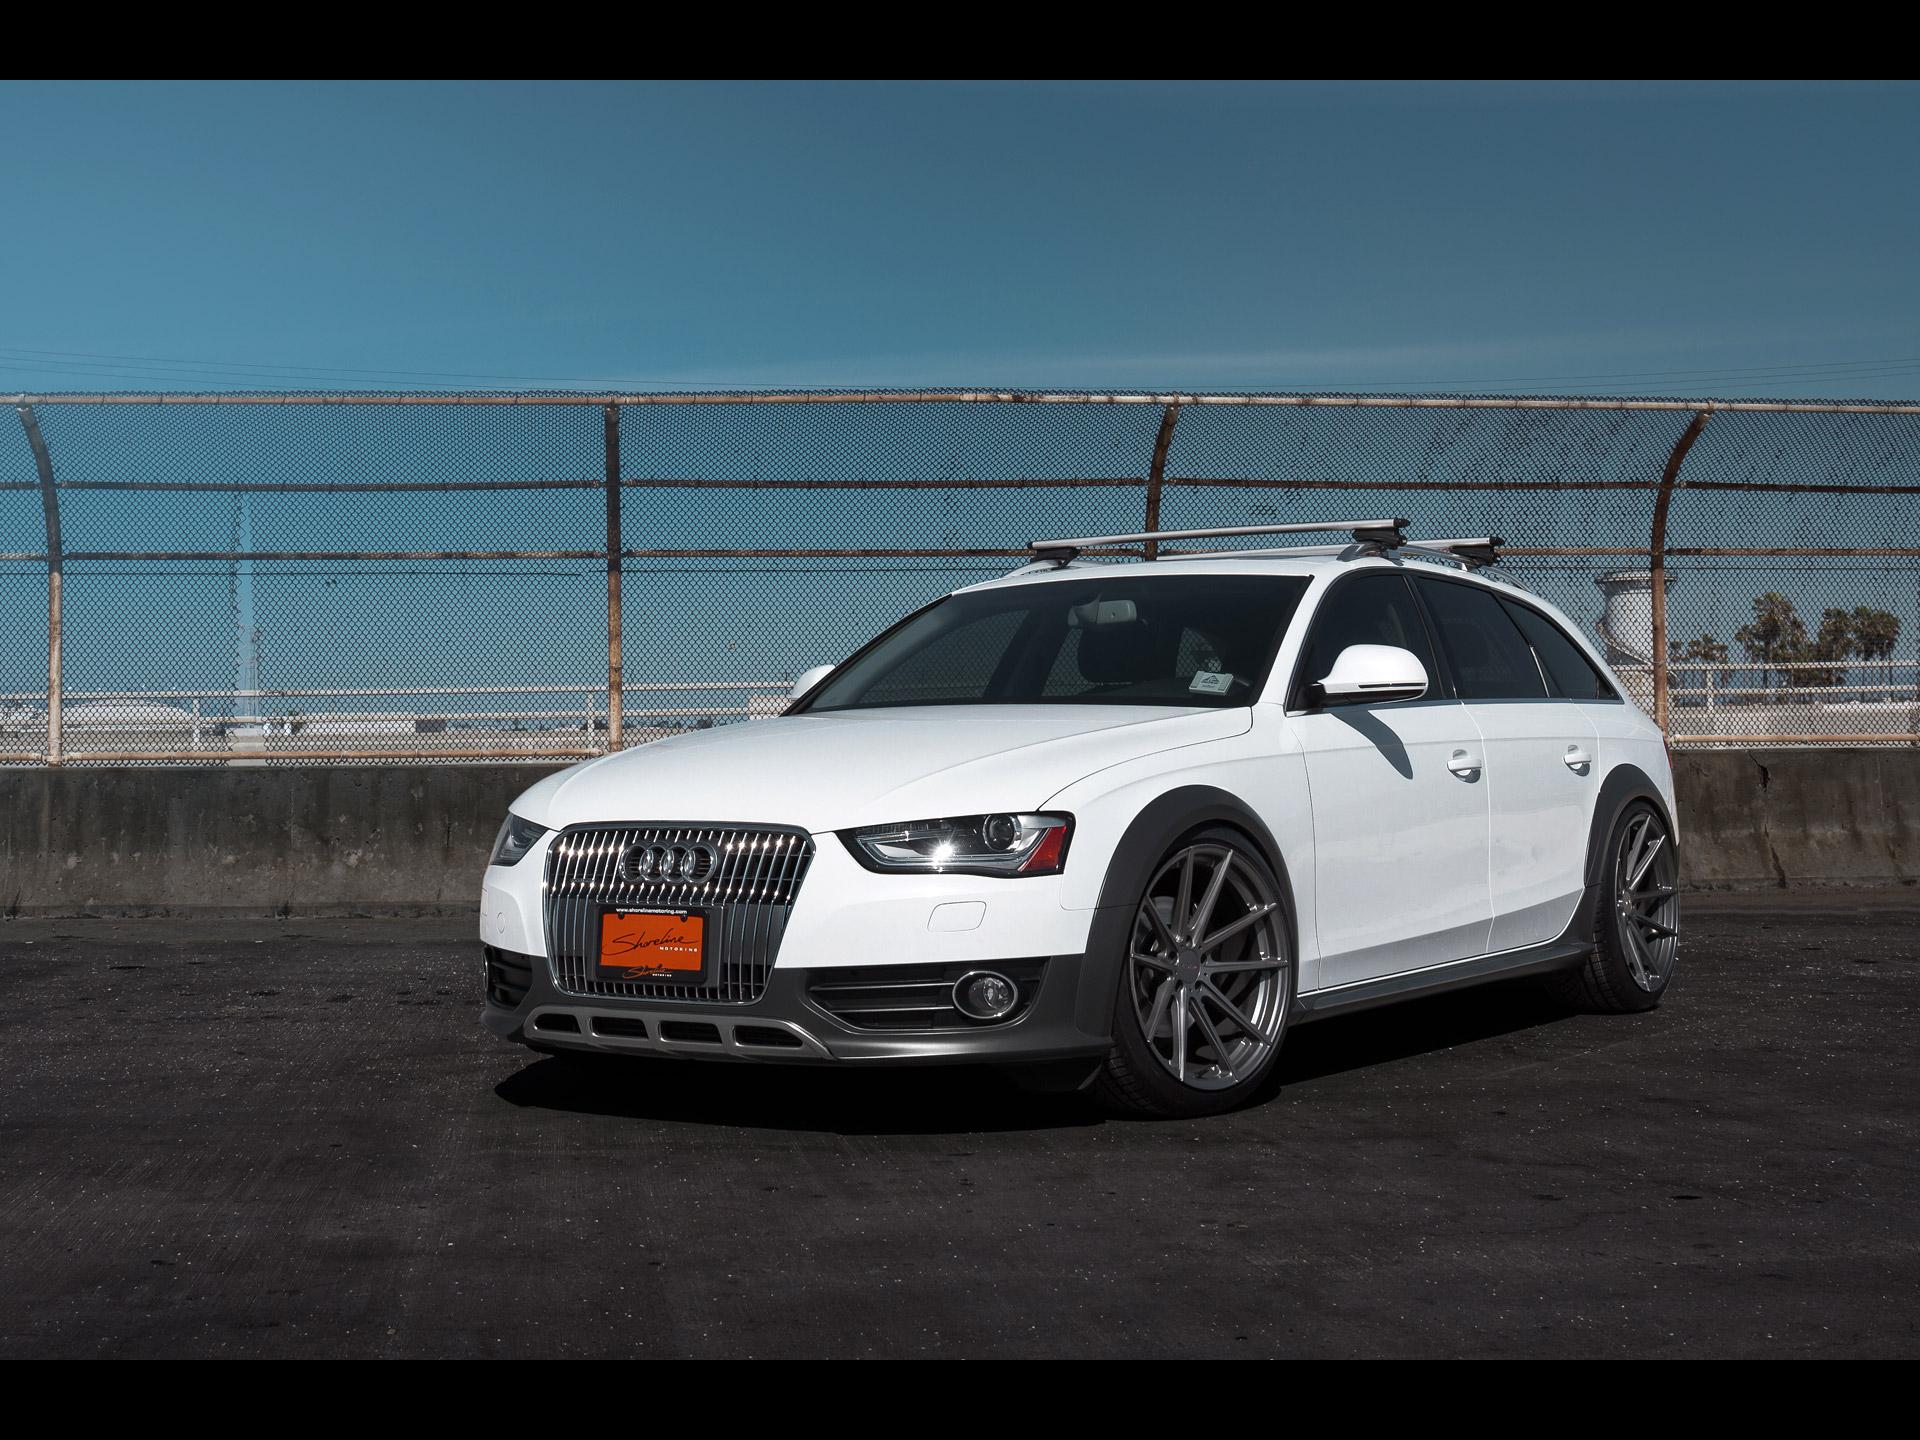 Tsw Wheels Audi A4 Allroad Quattro 2015 アウディに嵌まる 壁紙画像ブログ